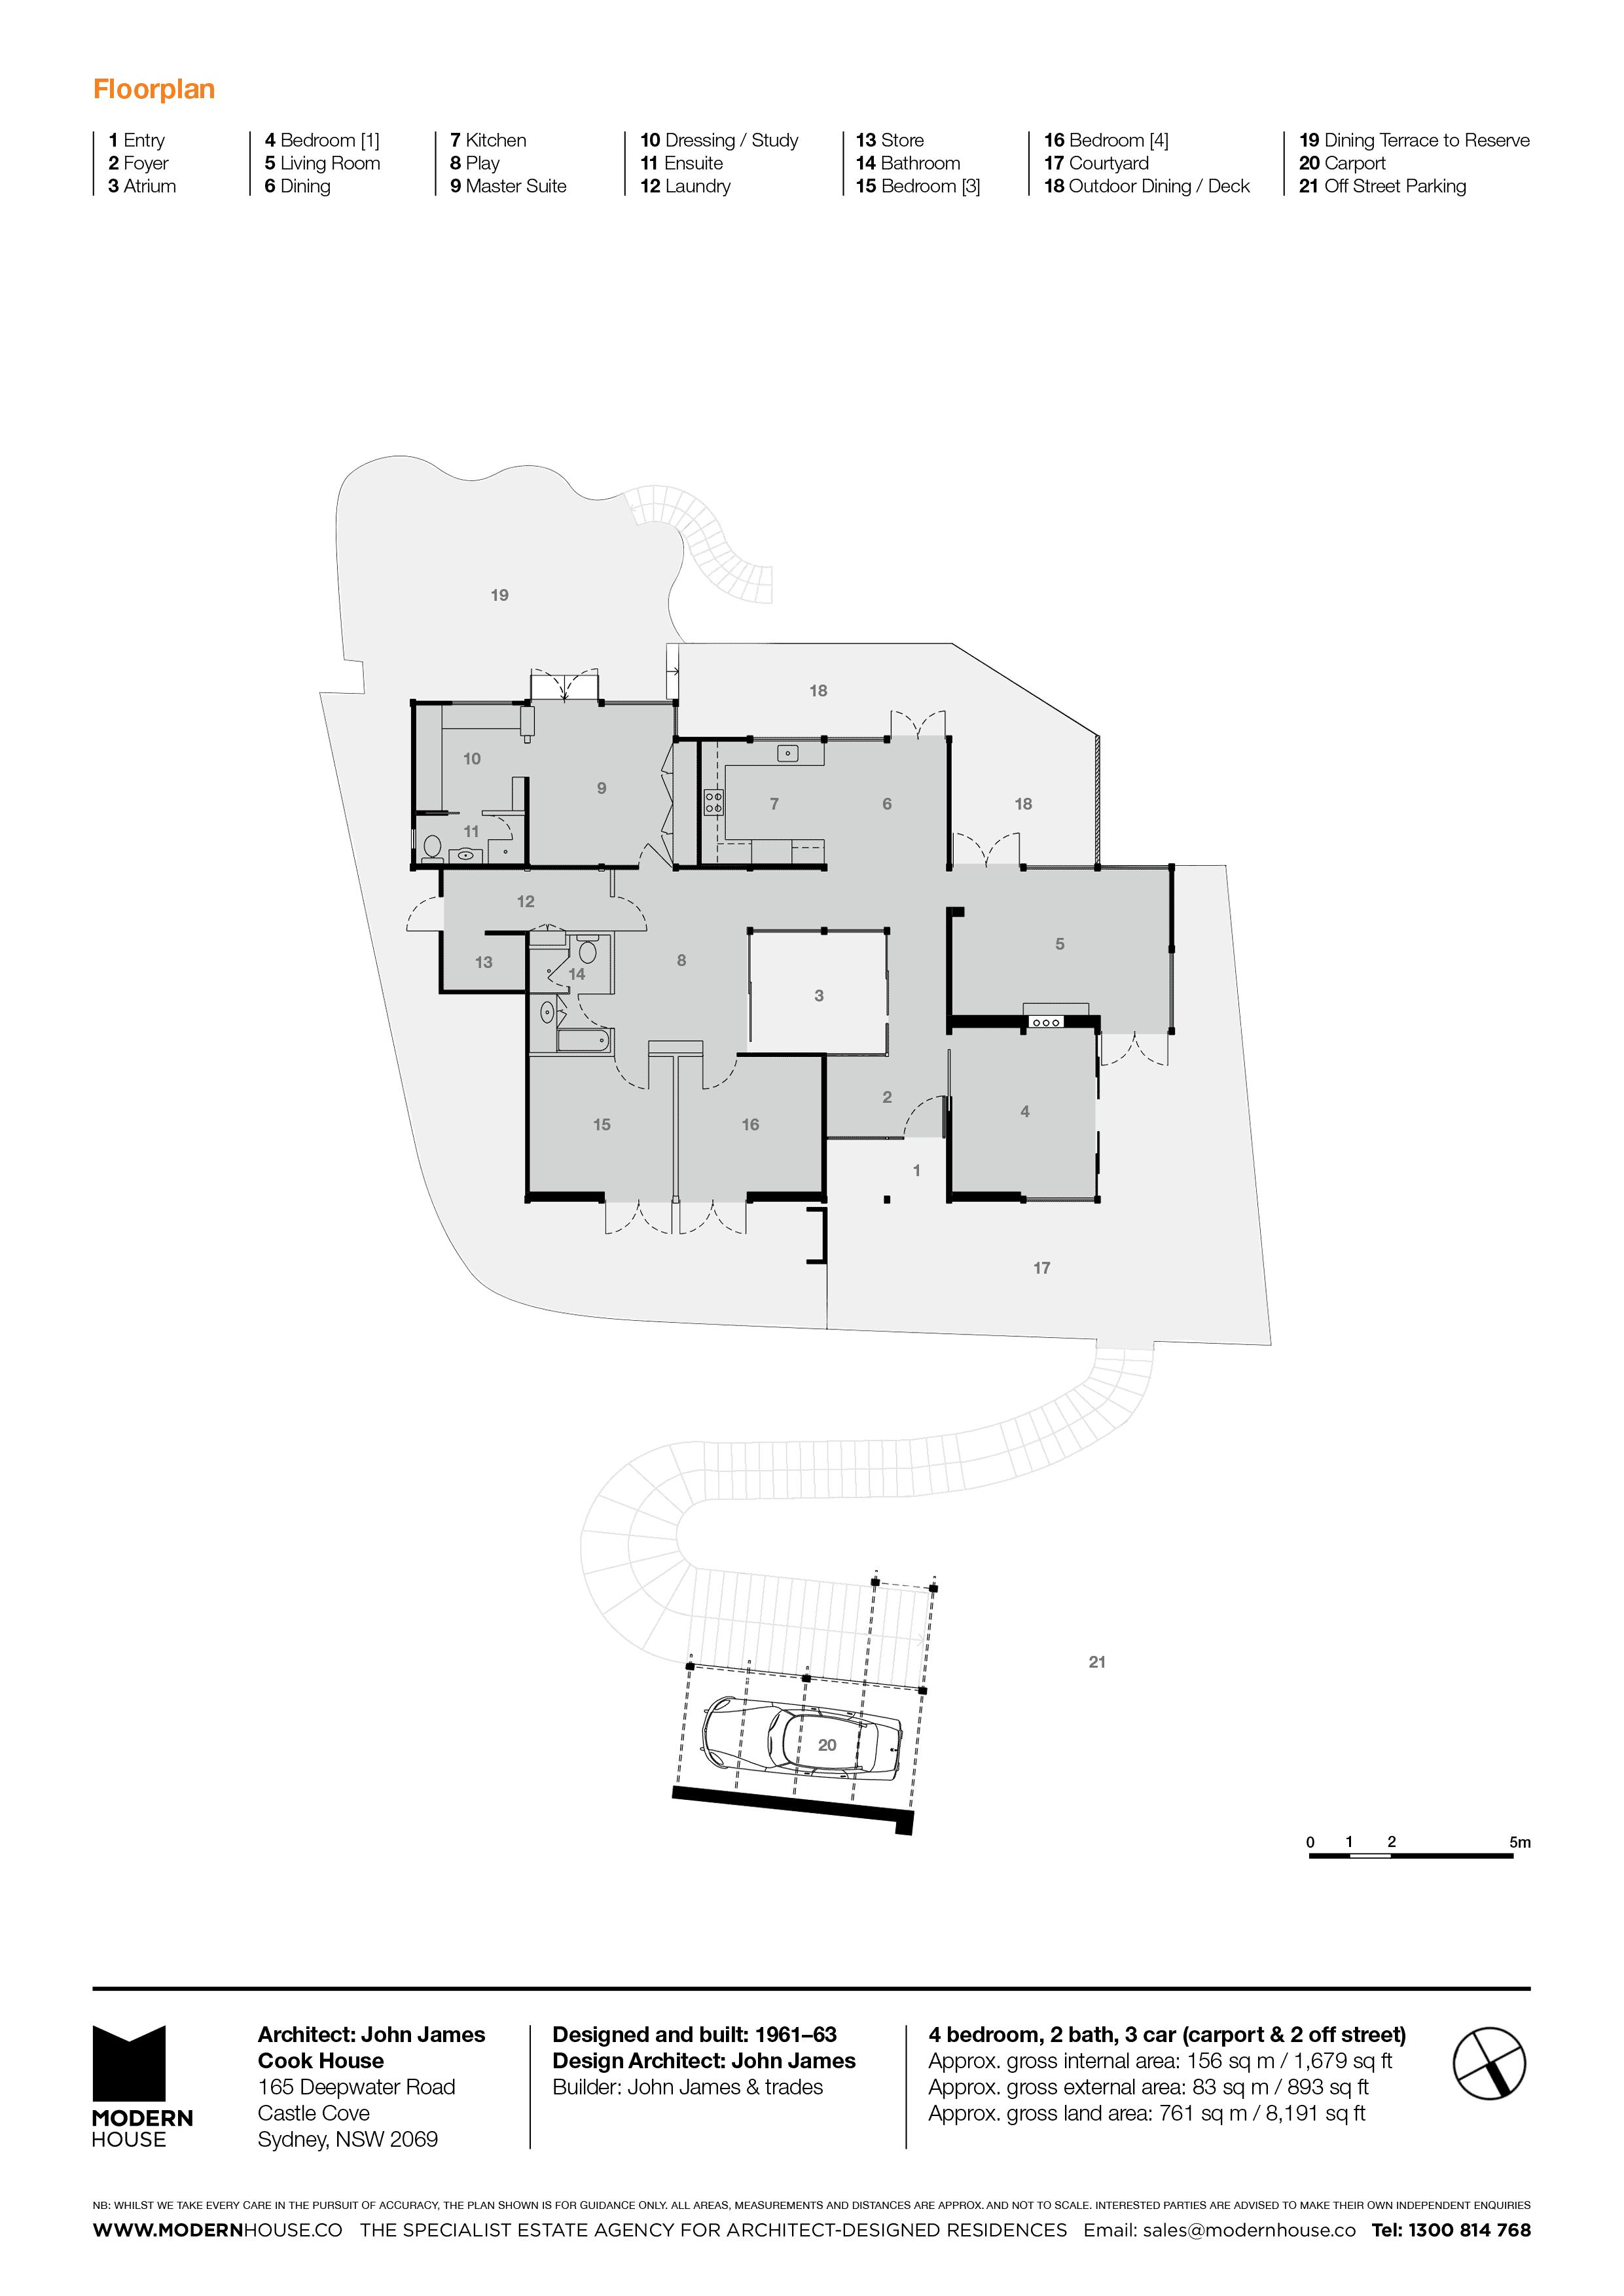 Architectdesigned Modern house for sale in Castle Cove Sydney